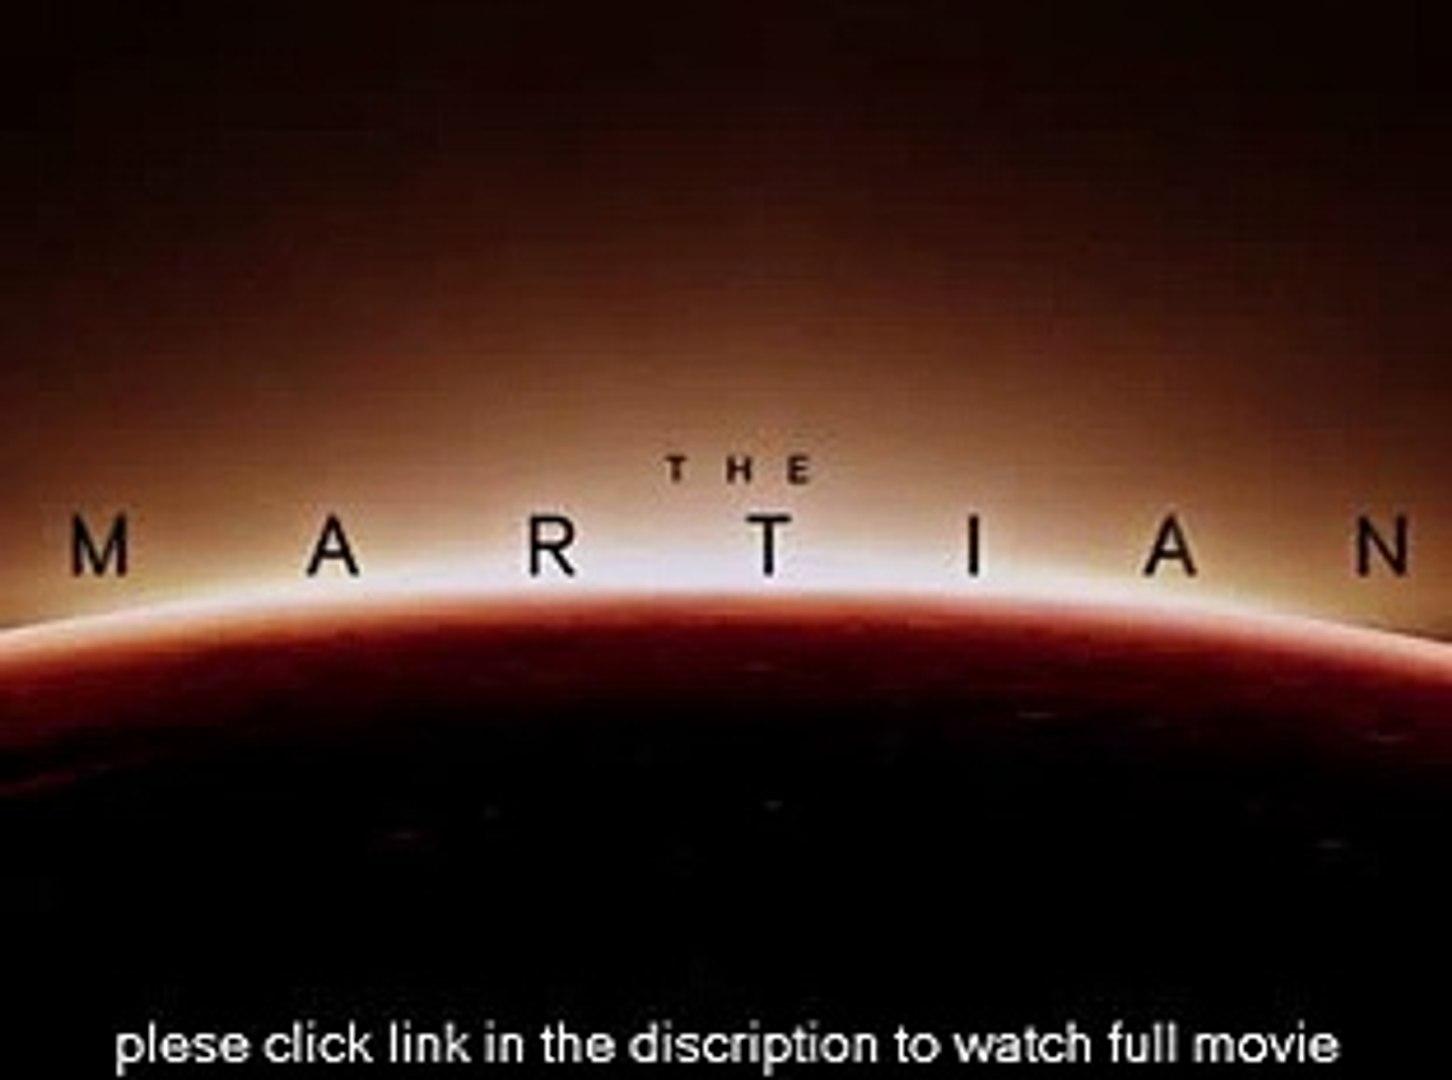 The Martian (2015) 영화